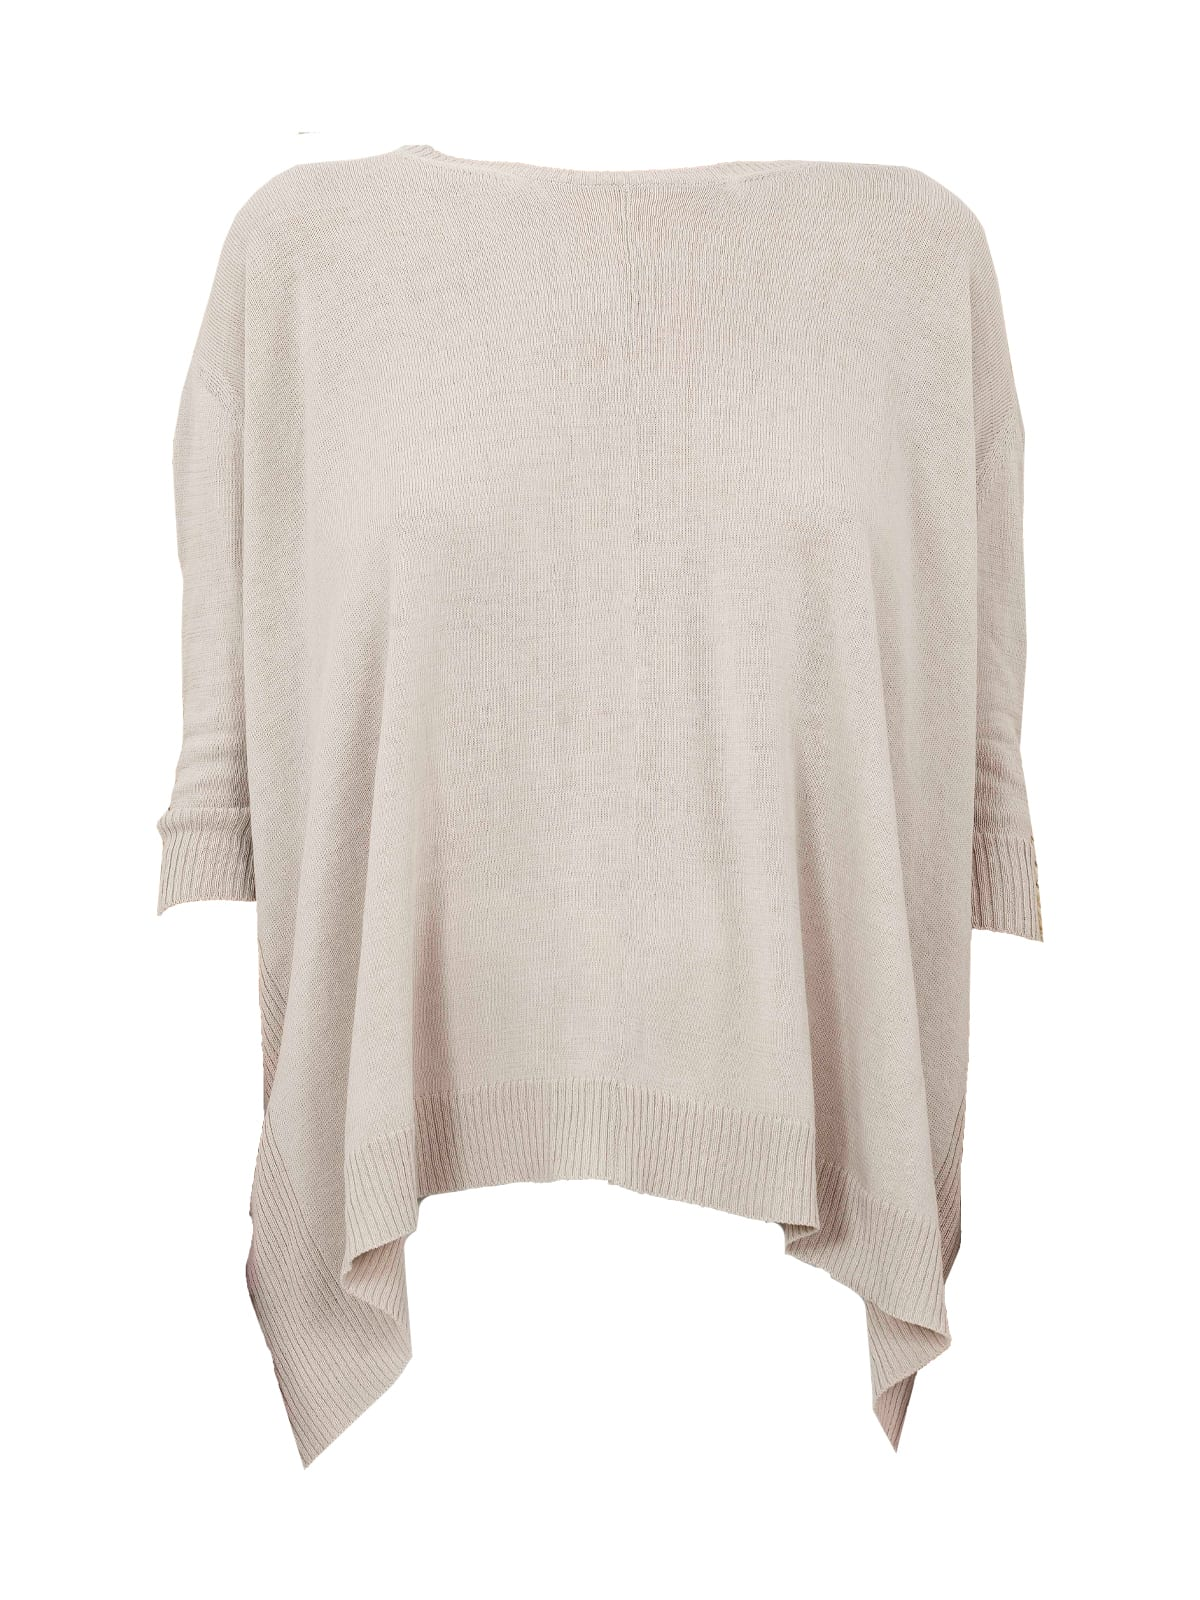 A Shape Cotton Crew Neck 3/4s Sweater